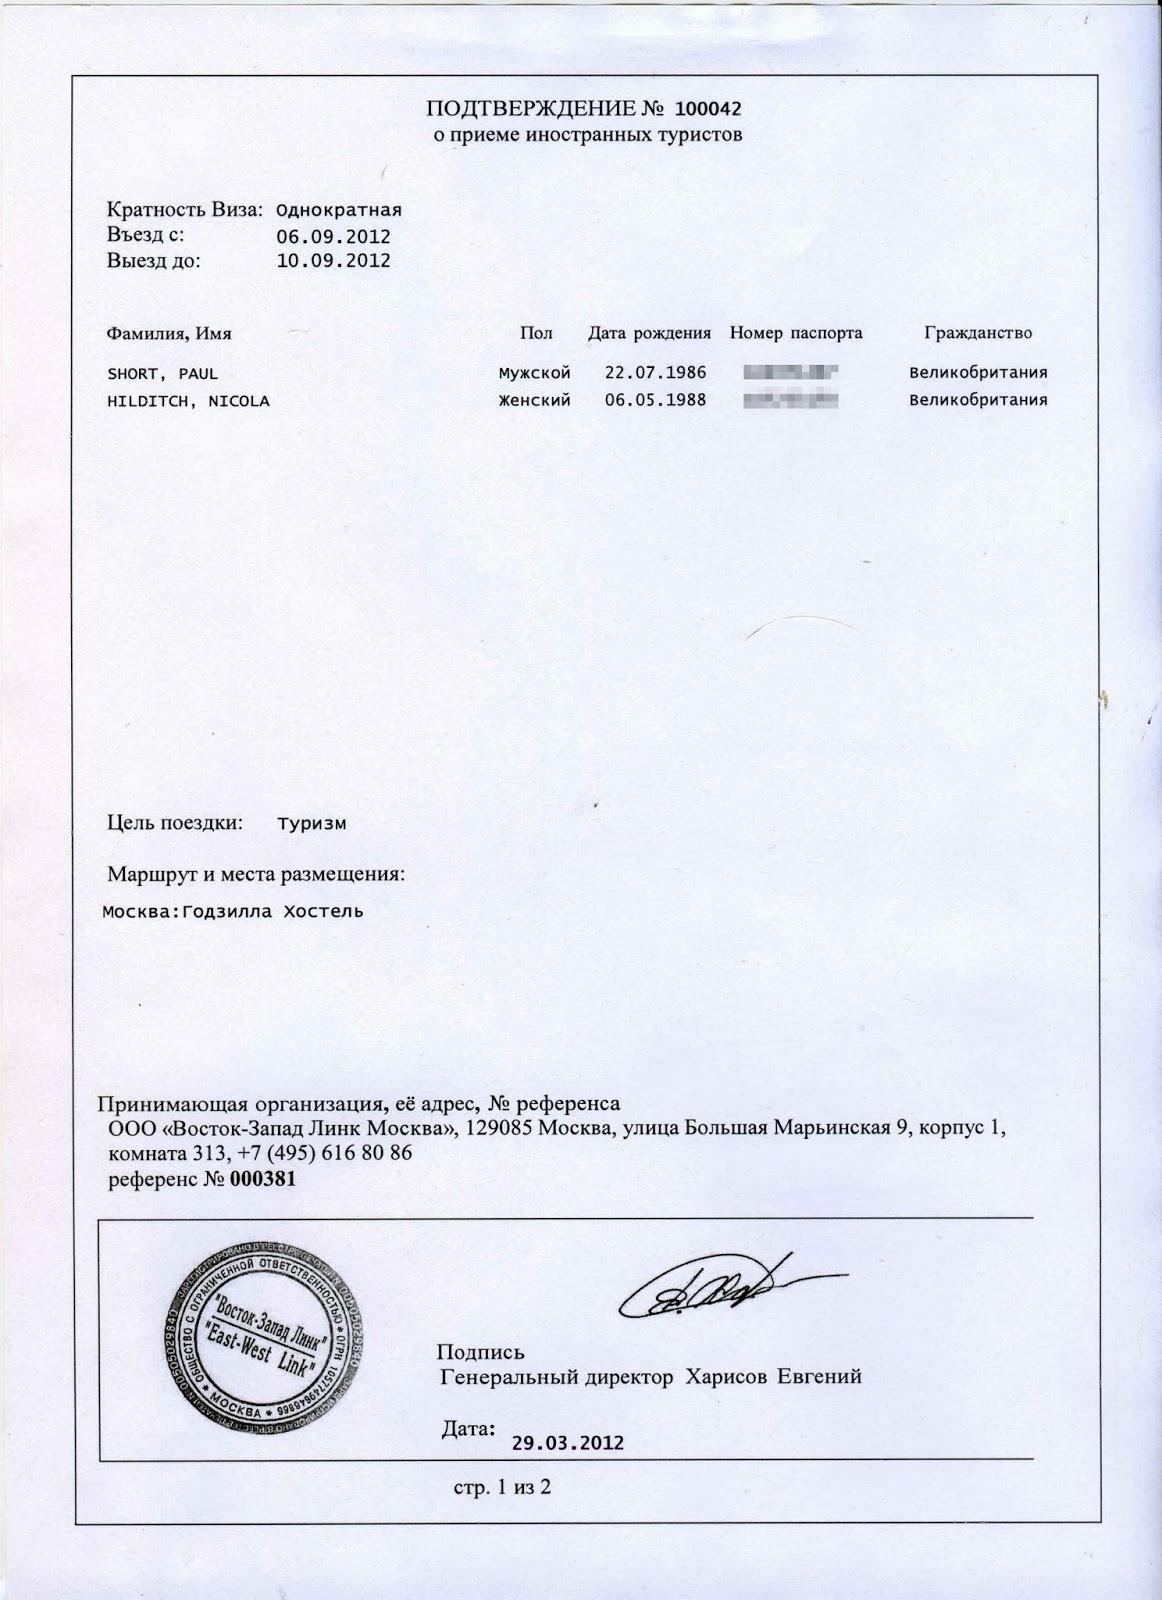 russian tourist visa application form pdf